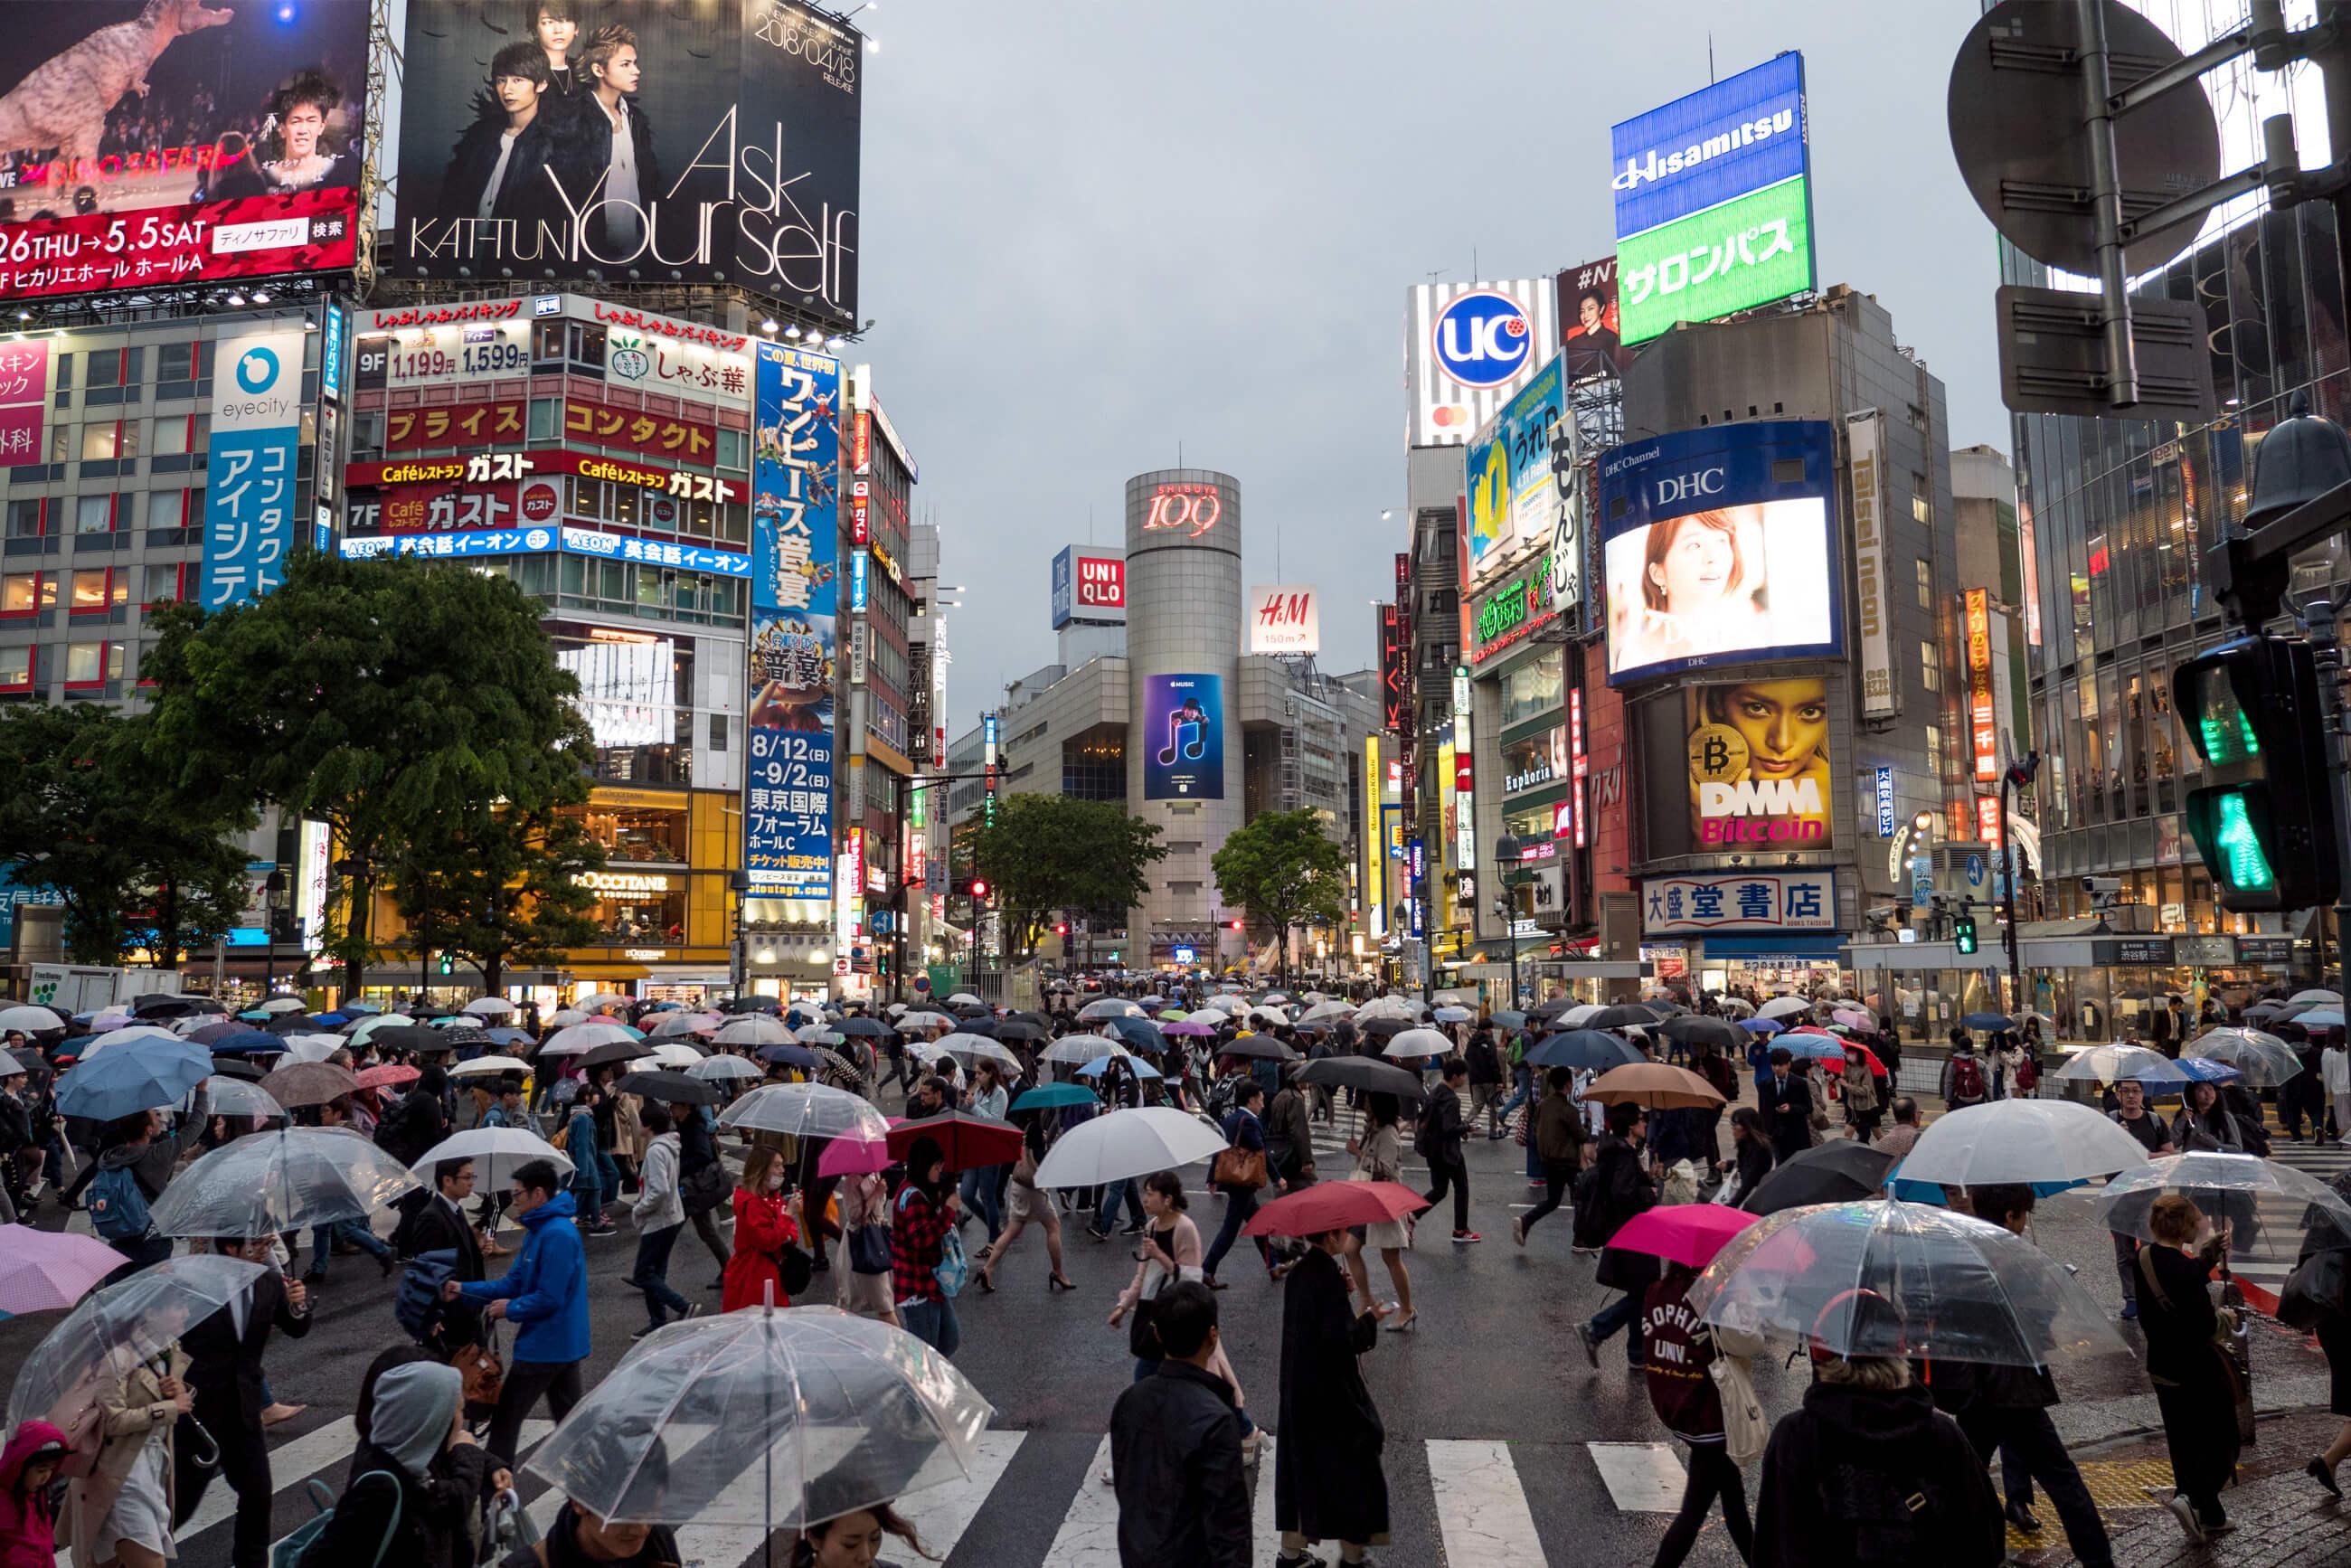 https://bubo.sk/uploads/galleries/7300/martinsimko_japonsko_shibuya-crossing.jpg